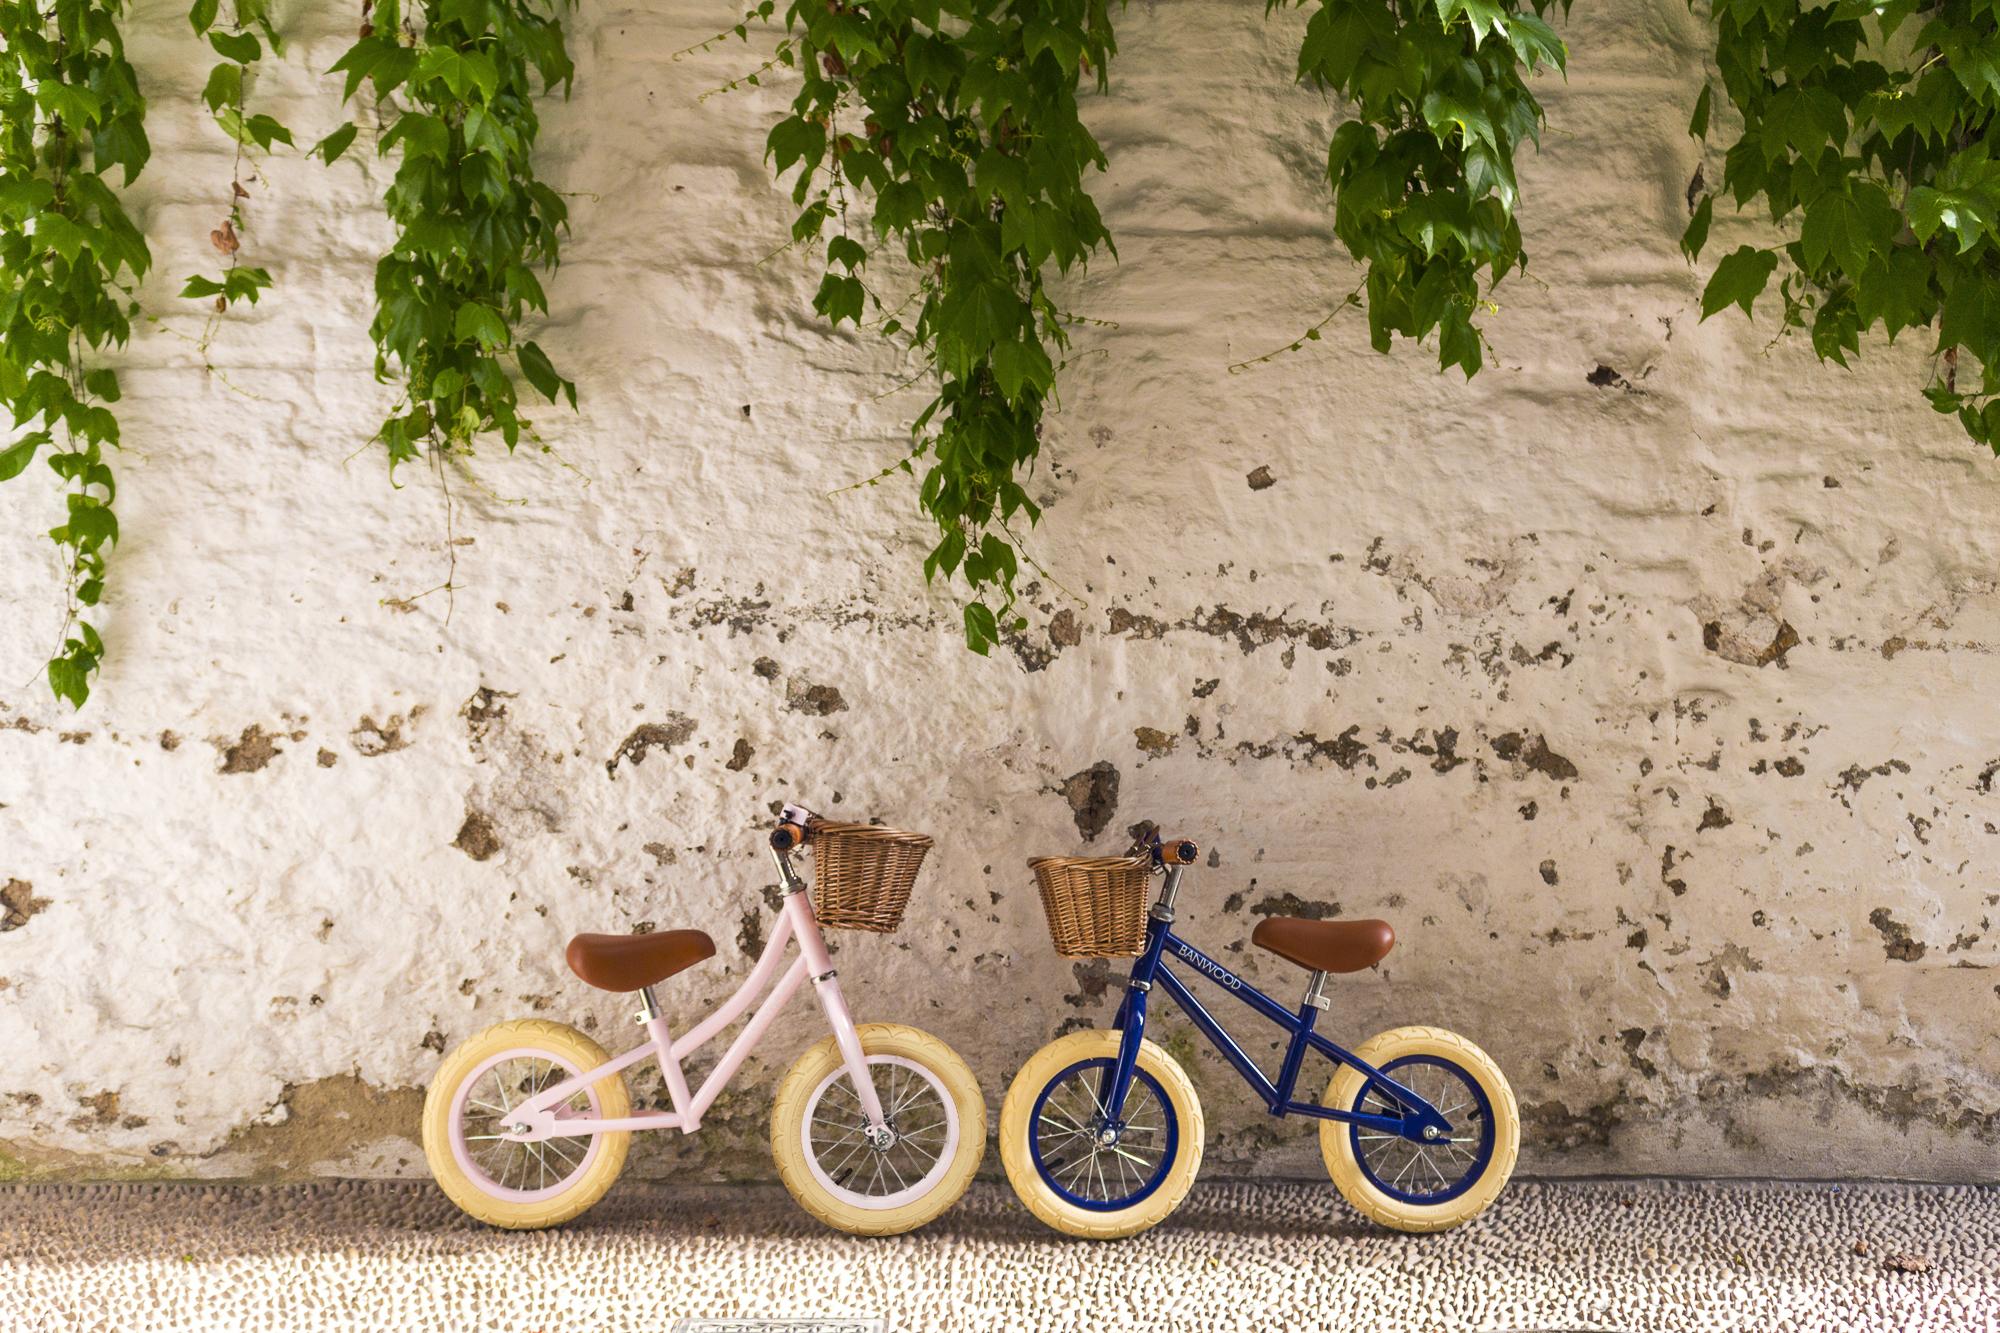 Beyond the Stork kids bicycles